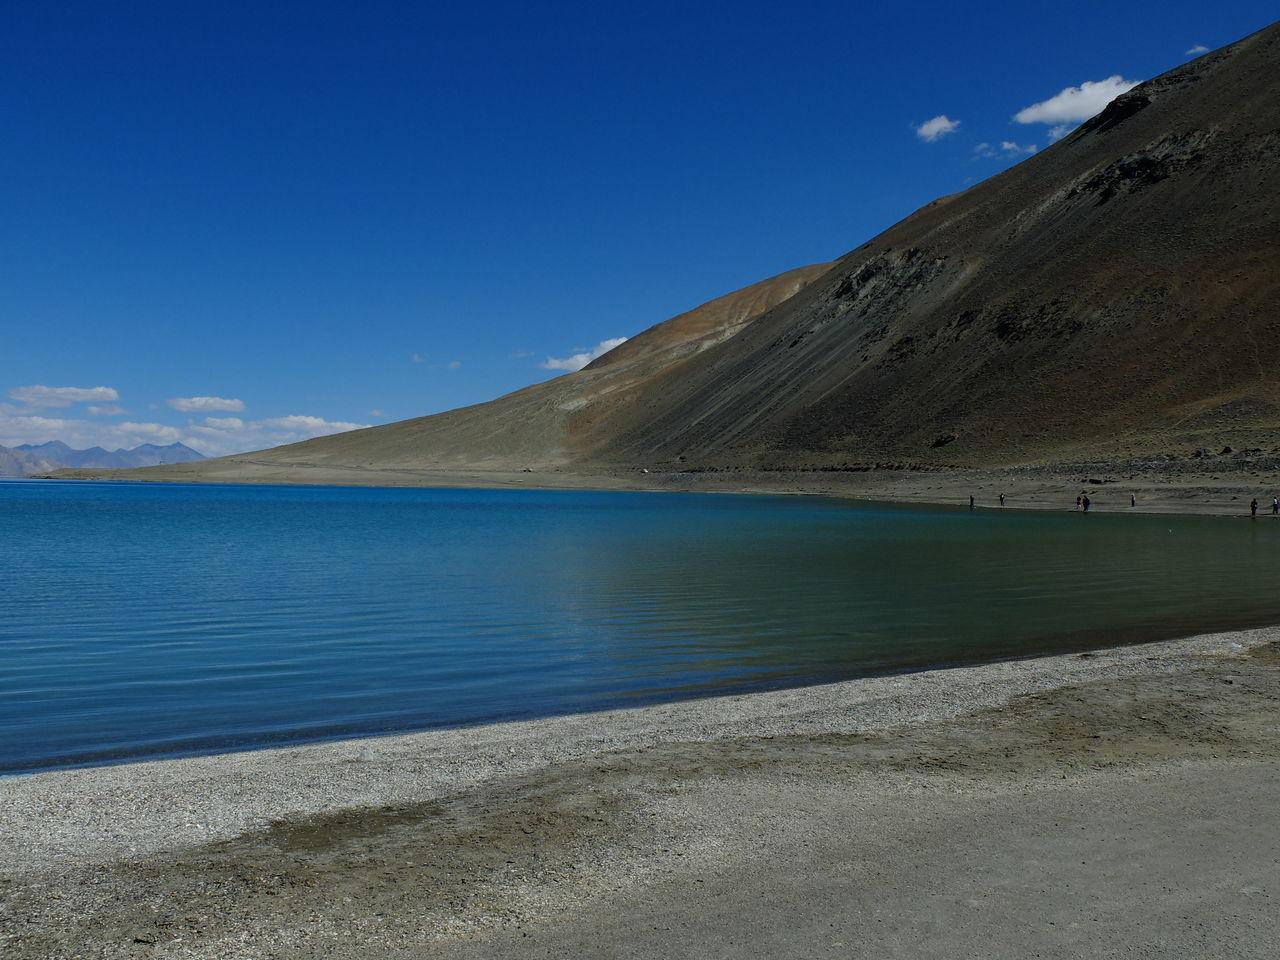 Beach Beauty In Nature Blue Day Jammu And Kashmir Lake Landscape Leh Ladakh Mountain Nature No People Outdoors Pangong Lake Pangong Tso Scenics Sky Water